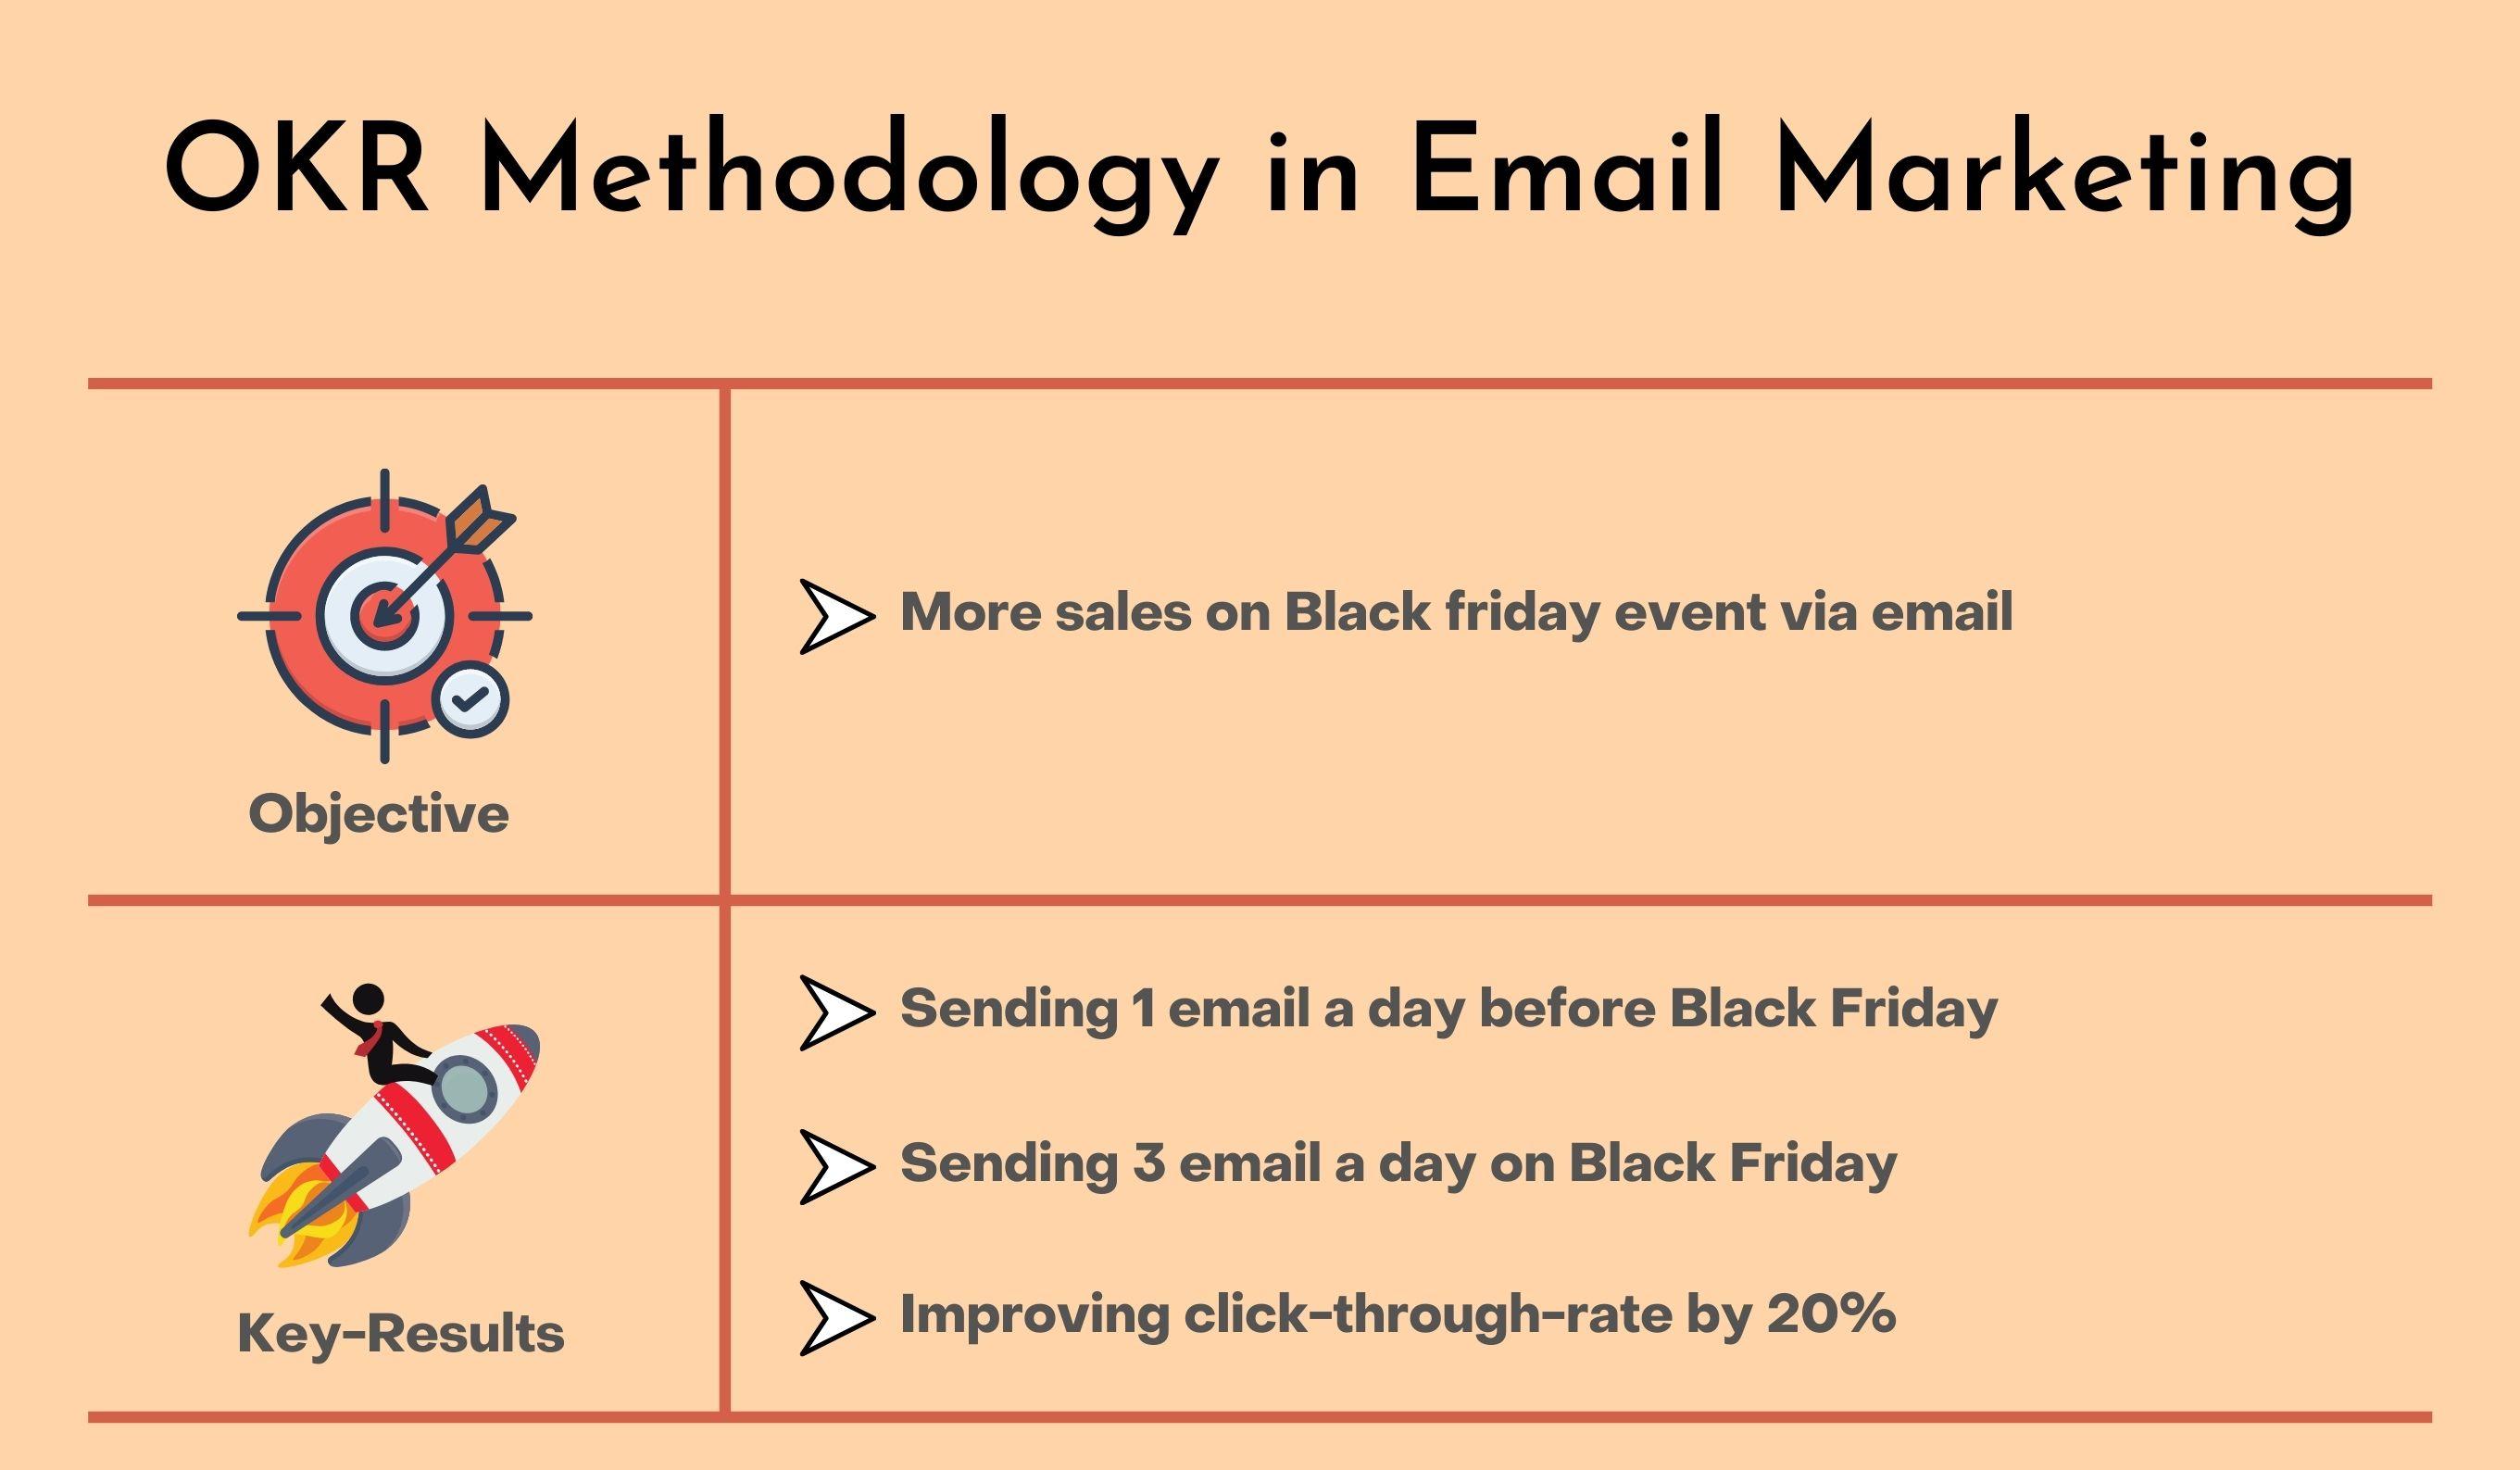 OKR Methodology in email marketing for agencies